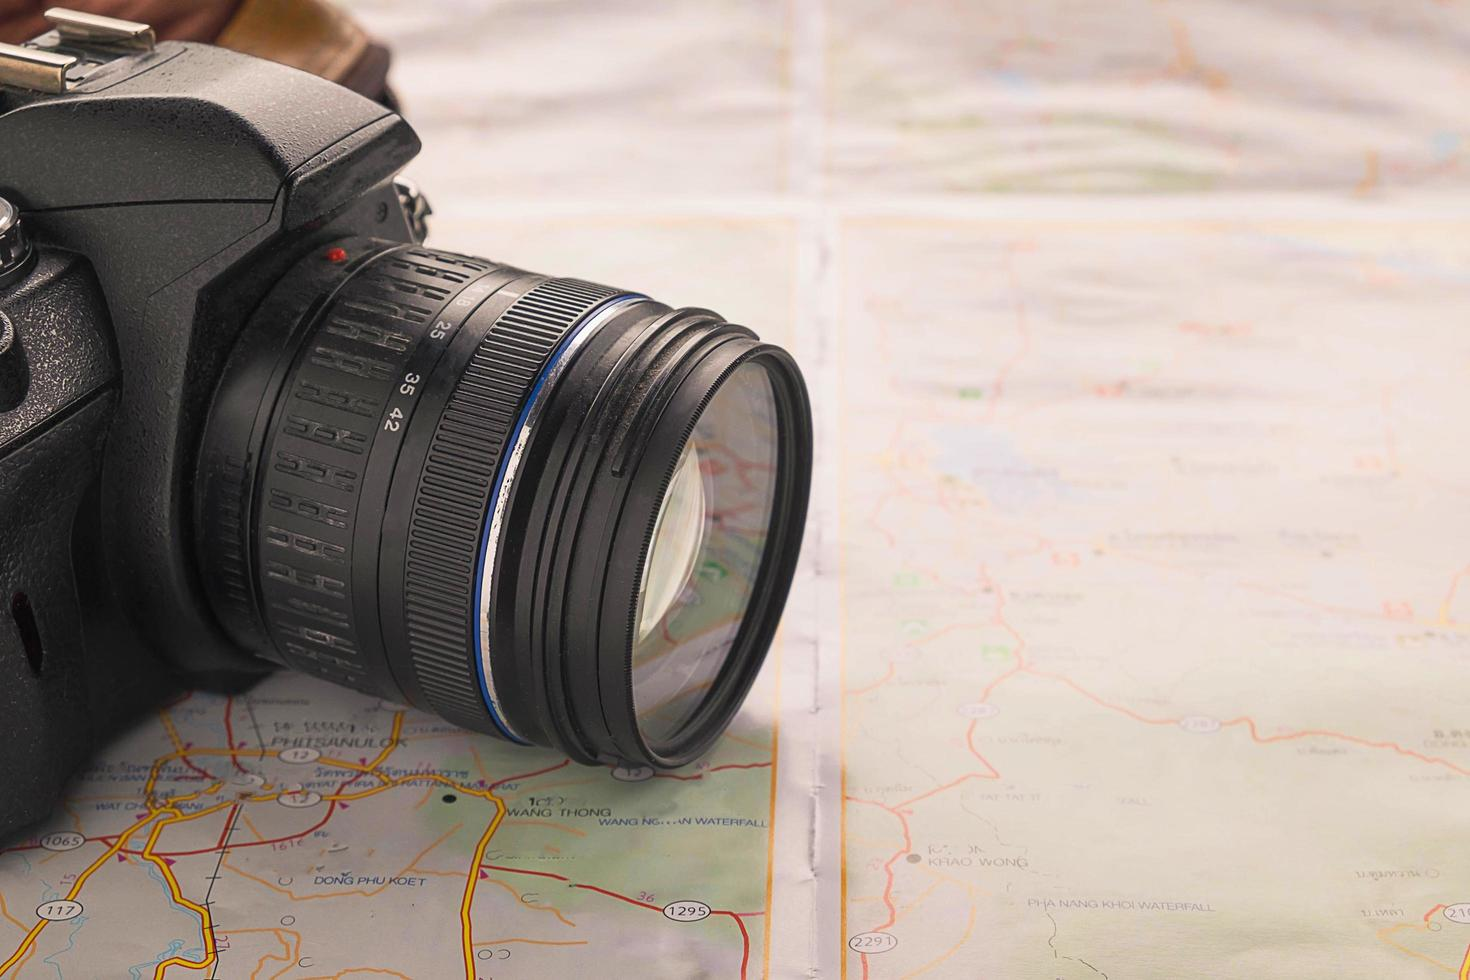 Camera on a map photo